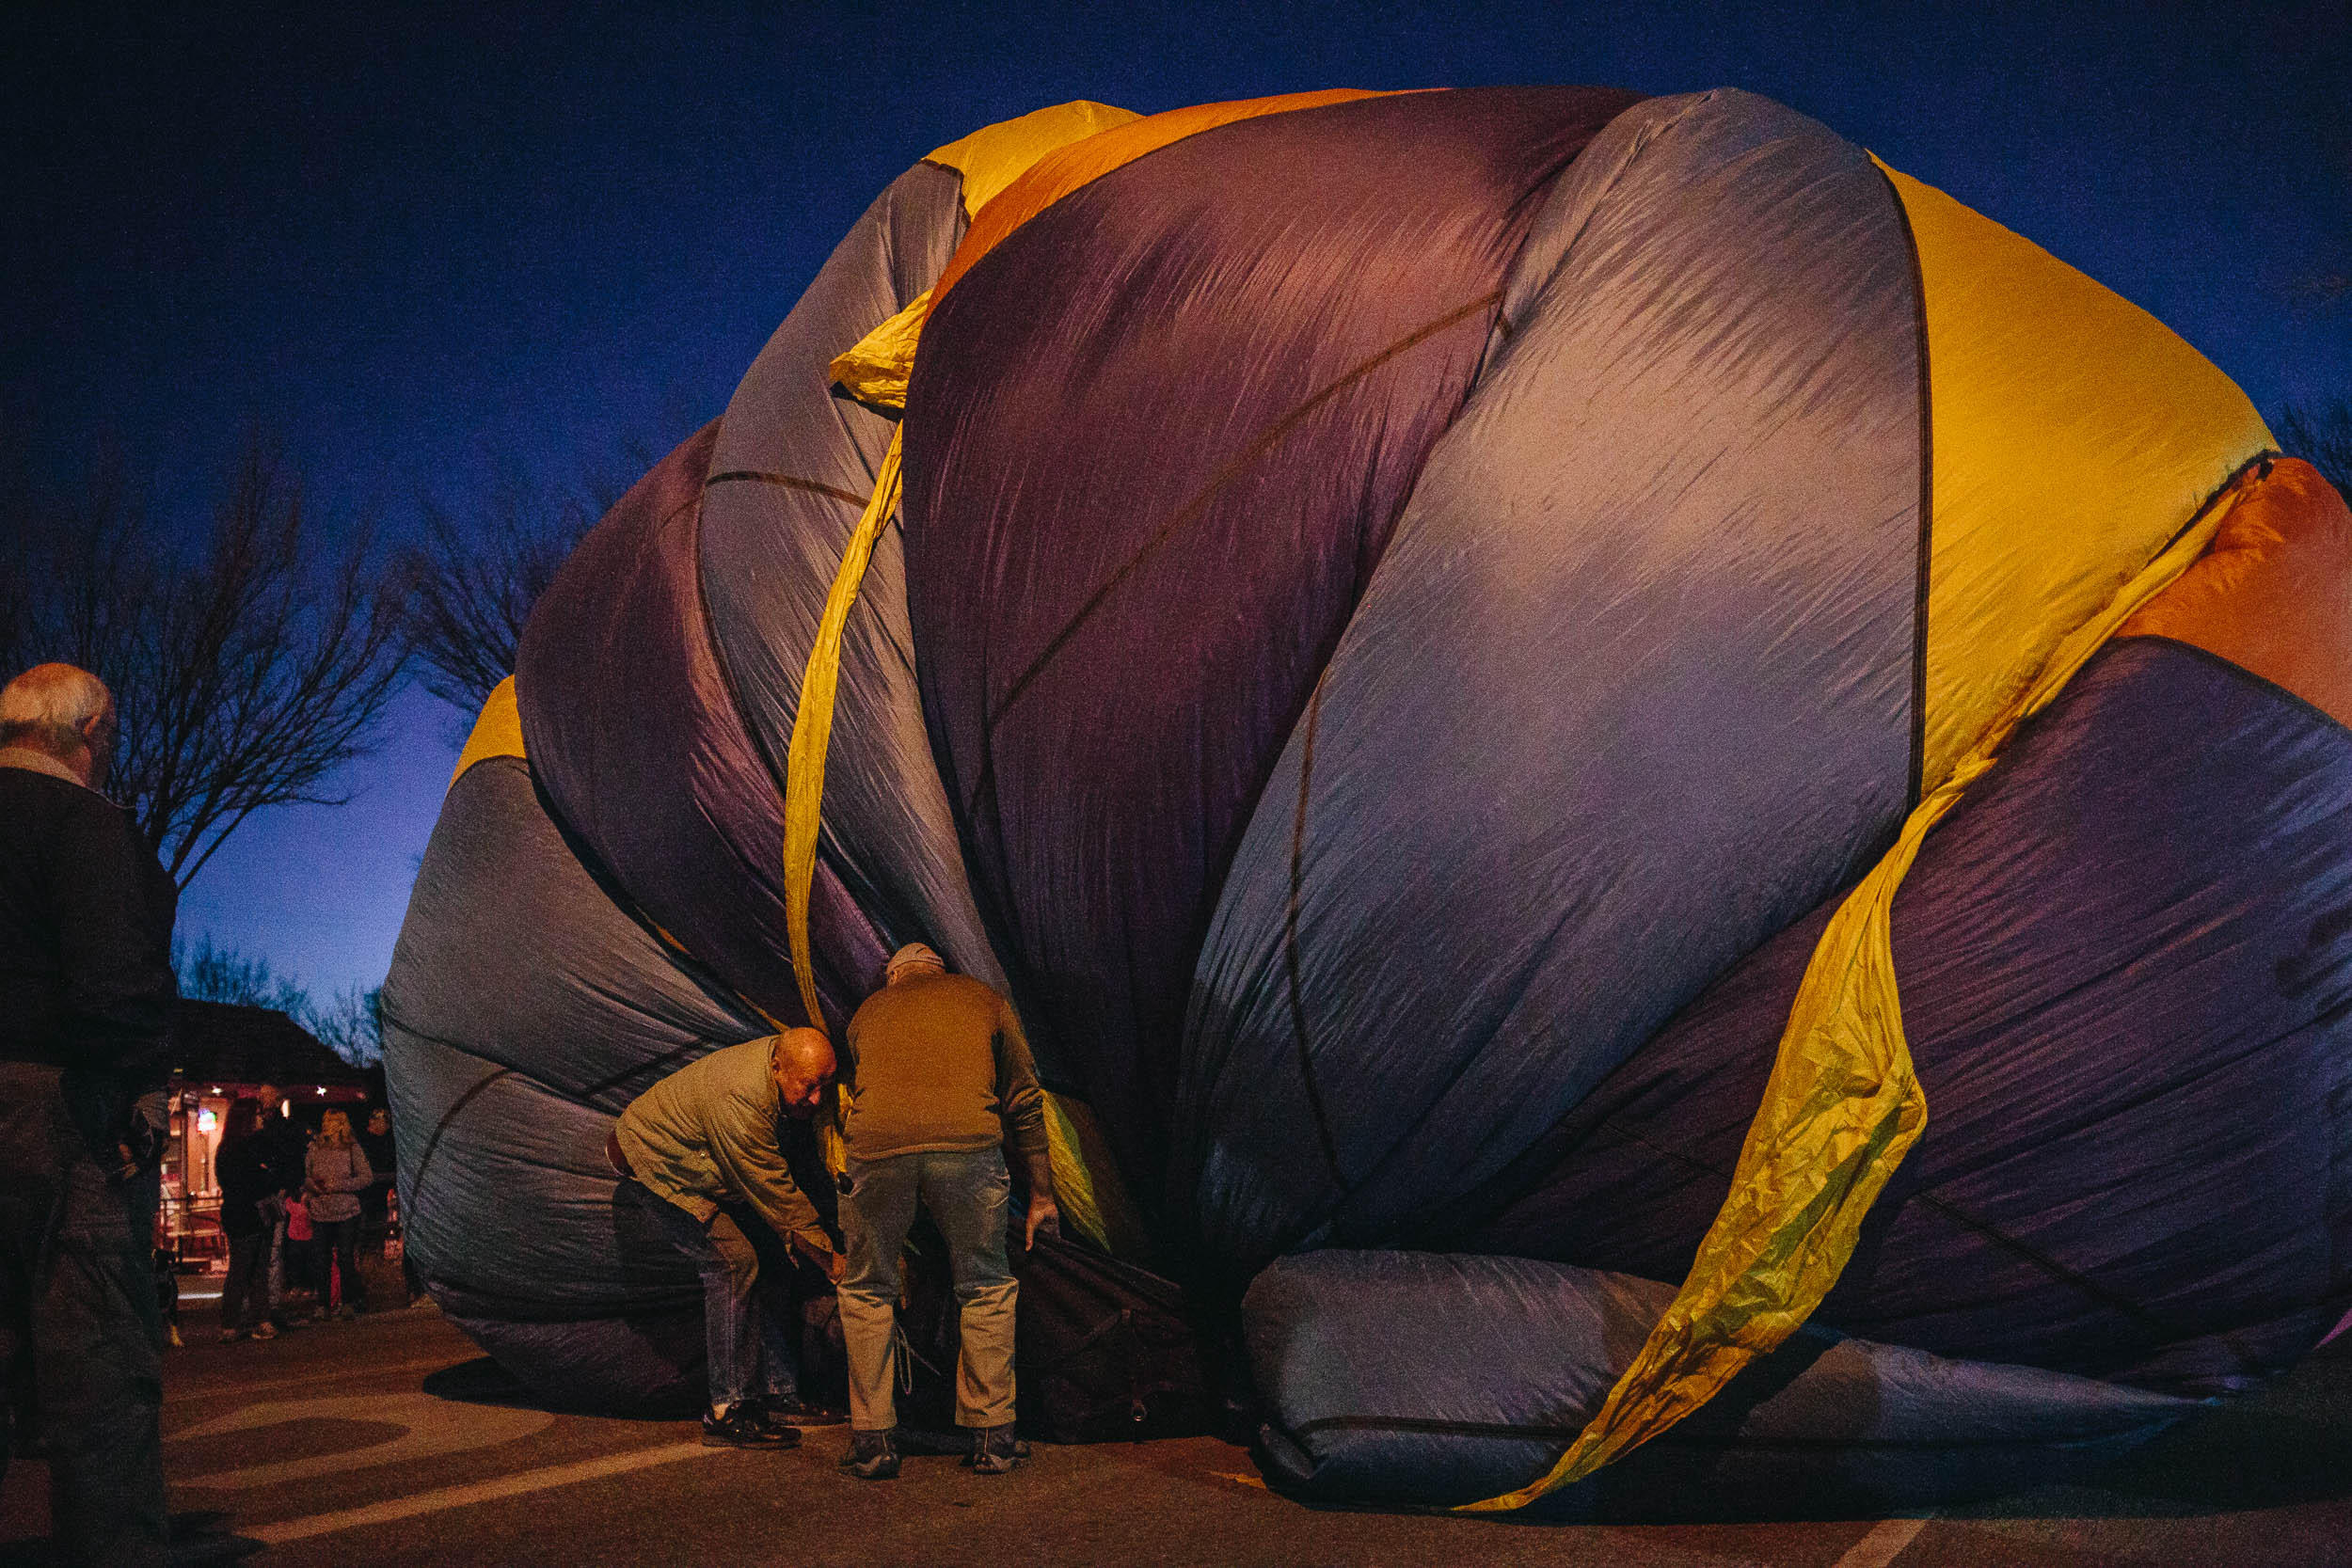 Kyle-Sheppard-Kanab-Balloon-Festival-42.jpg